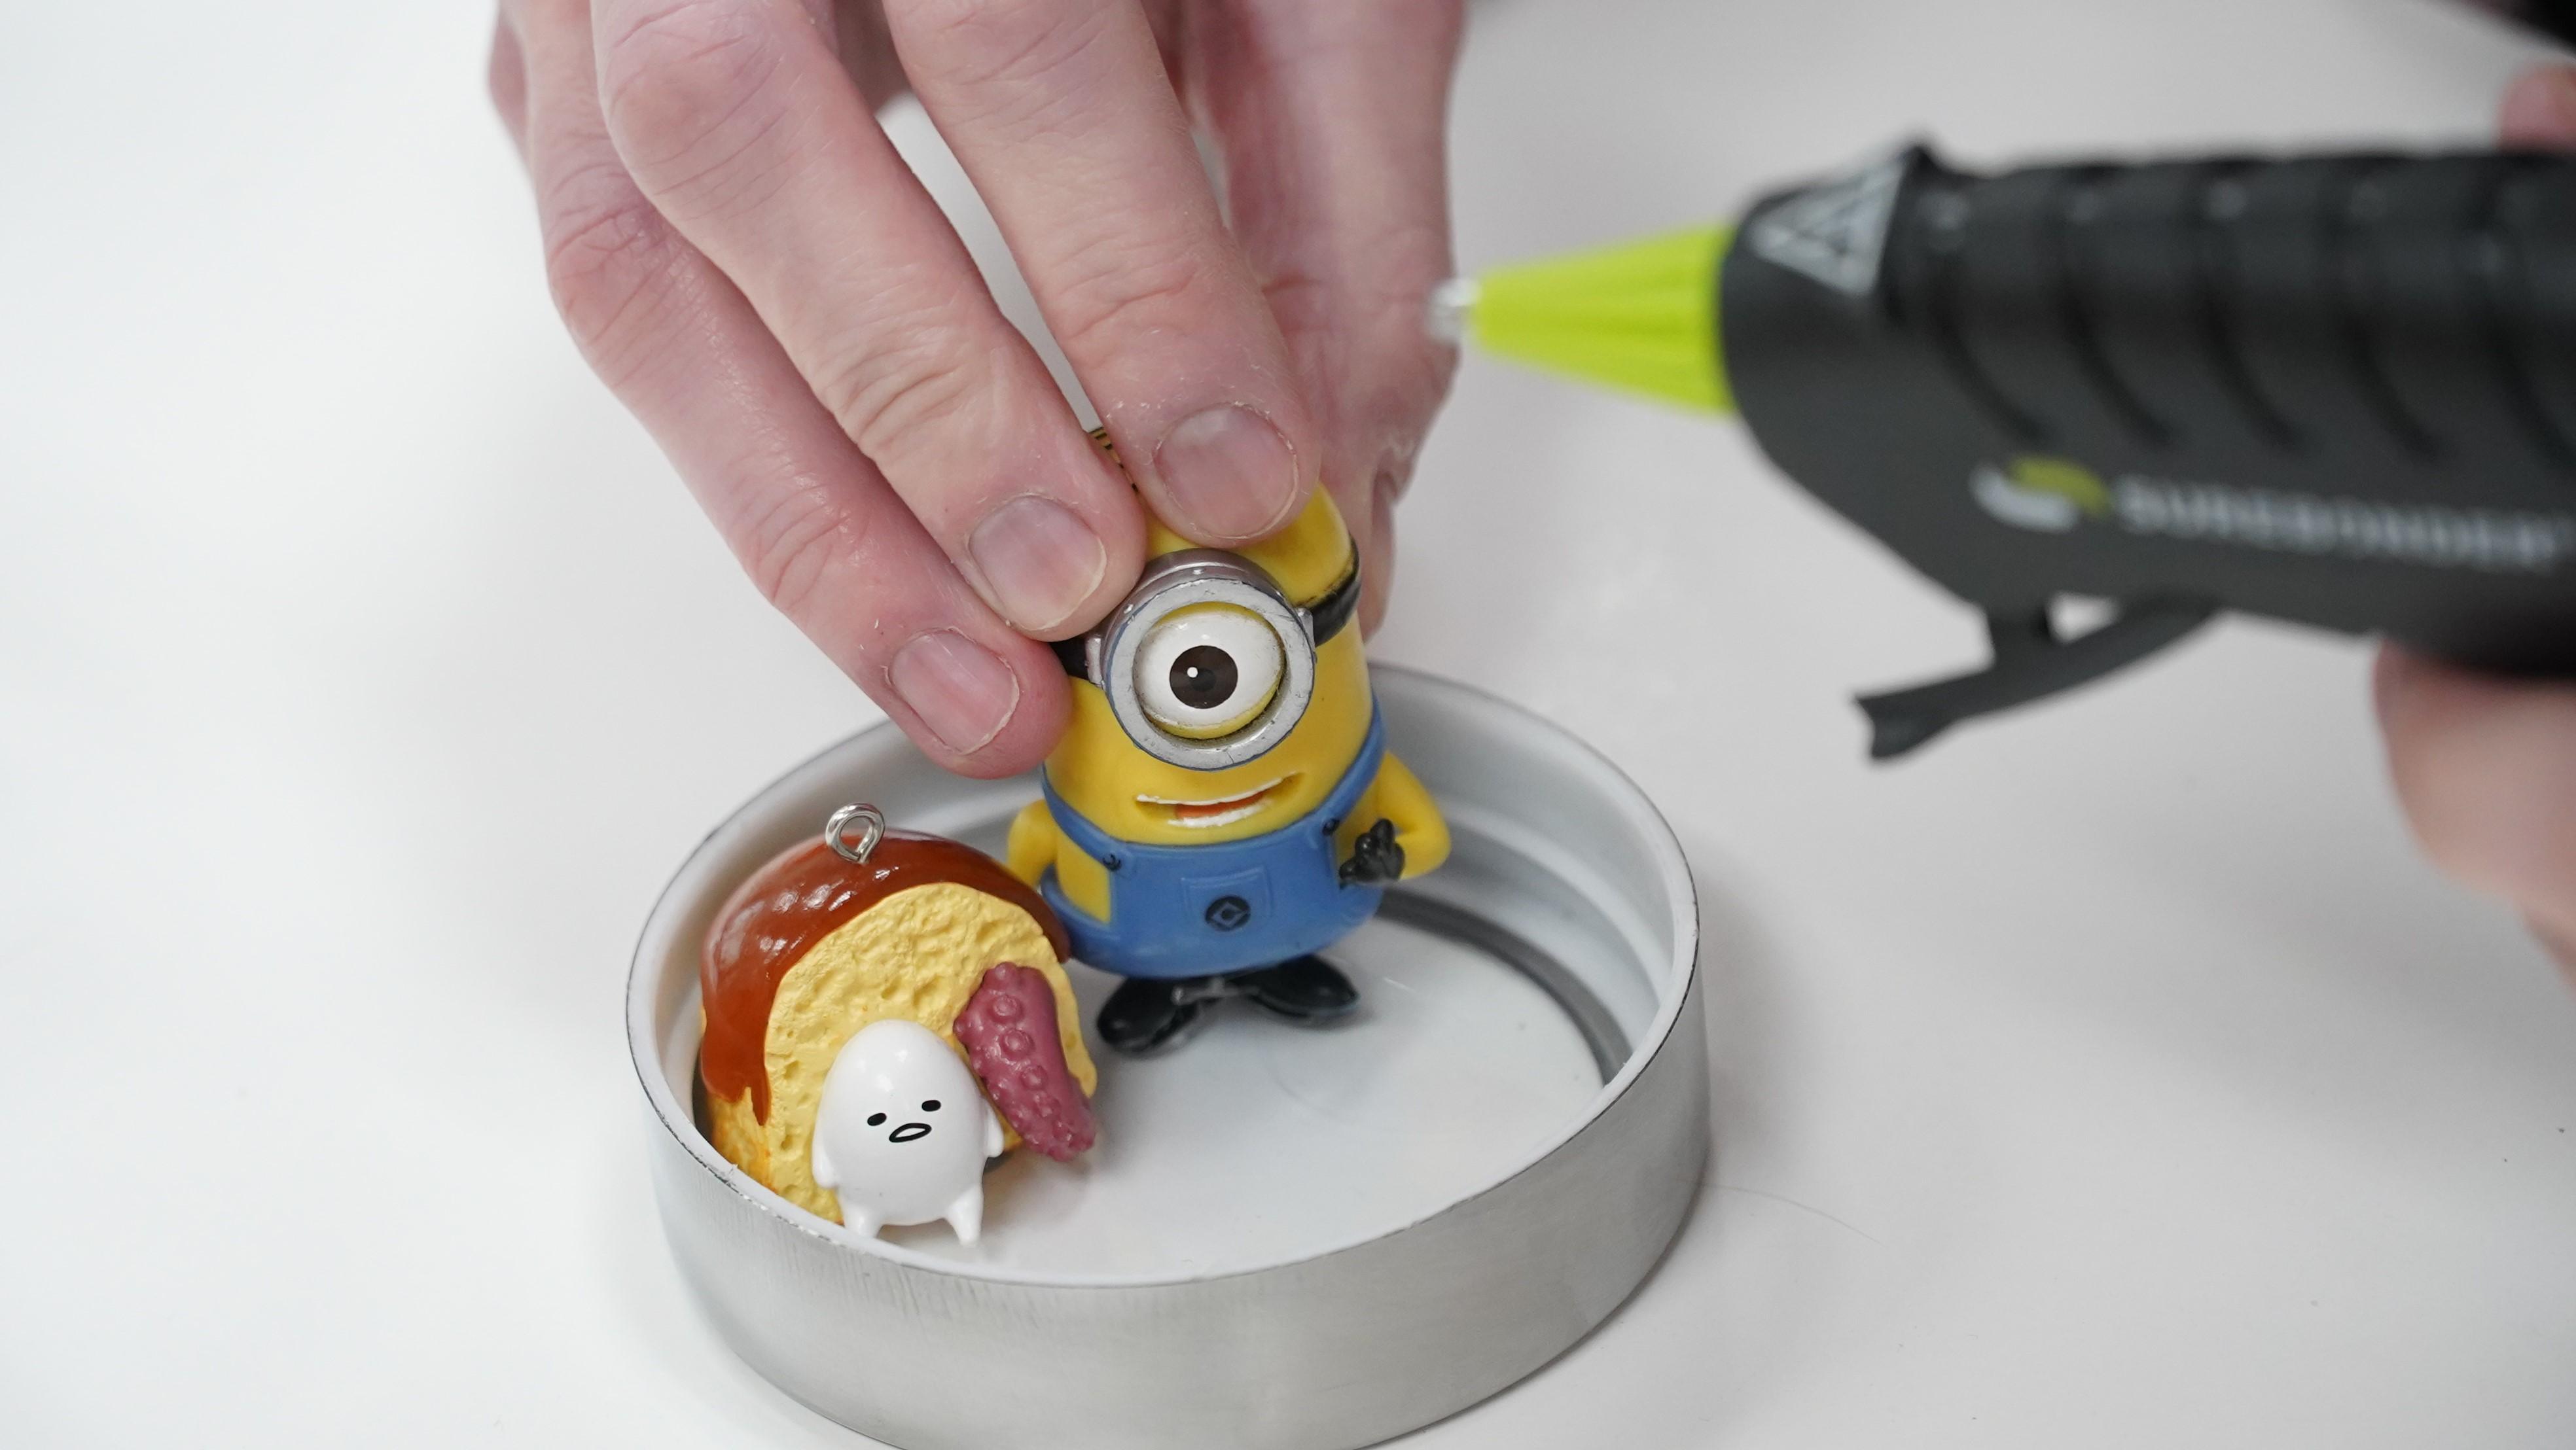 Placing figures on a jar lid